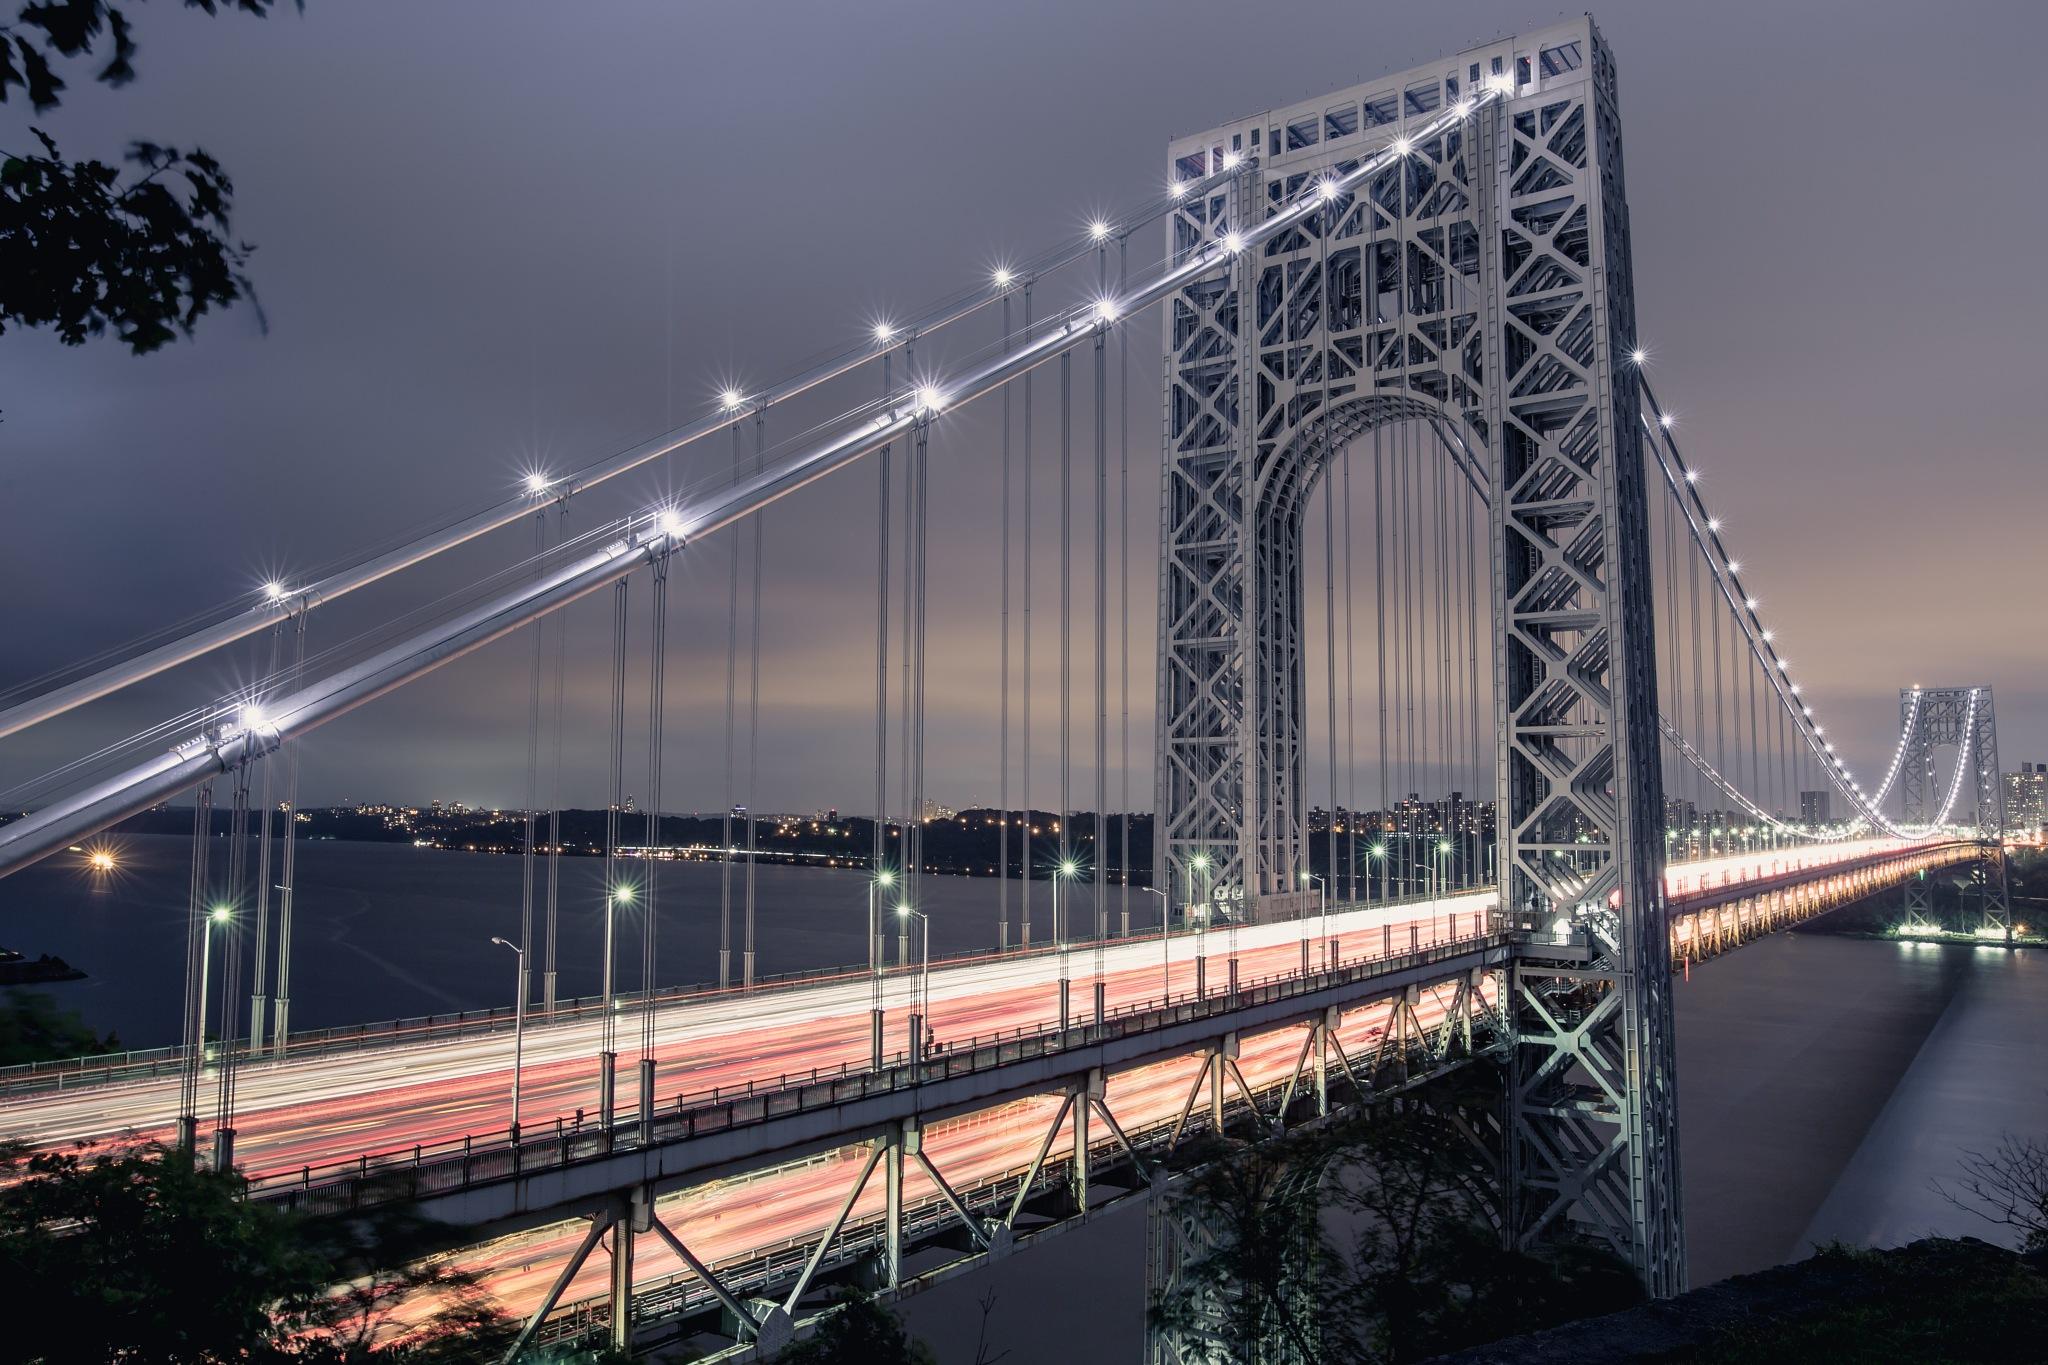 George Washington Bridge by dallaschristo